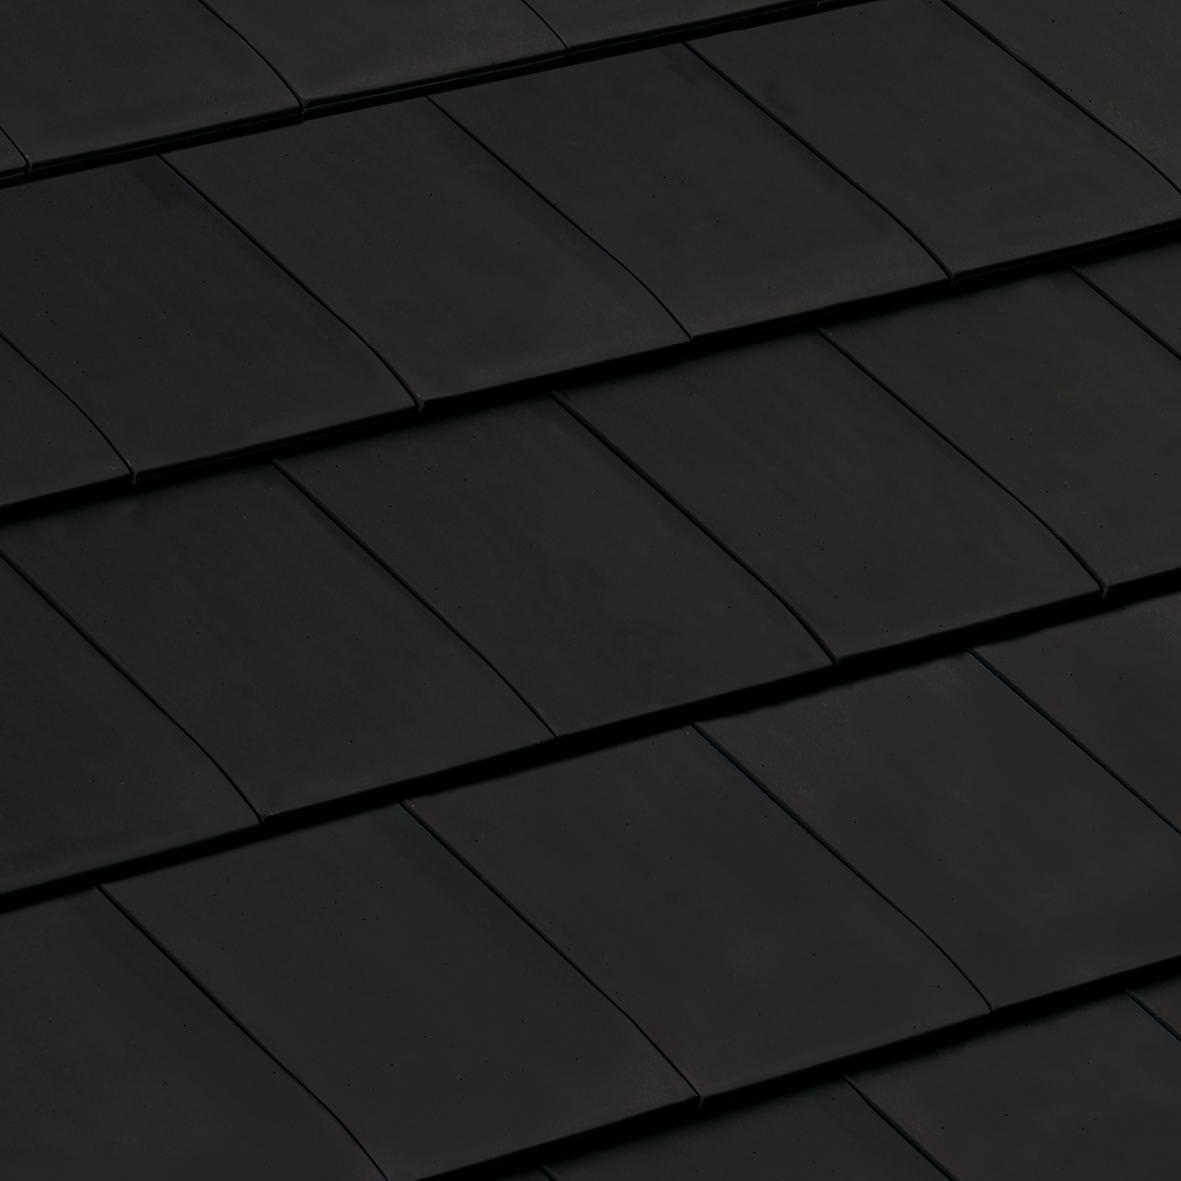 https://novemisto.biz/wp-content/uploads/2020/11/SIGNY_Black.jpg